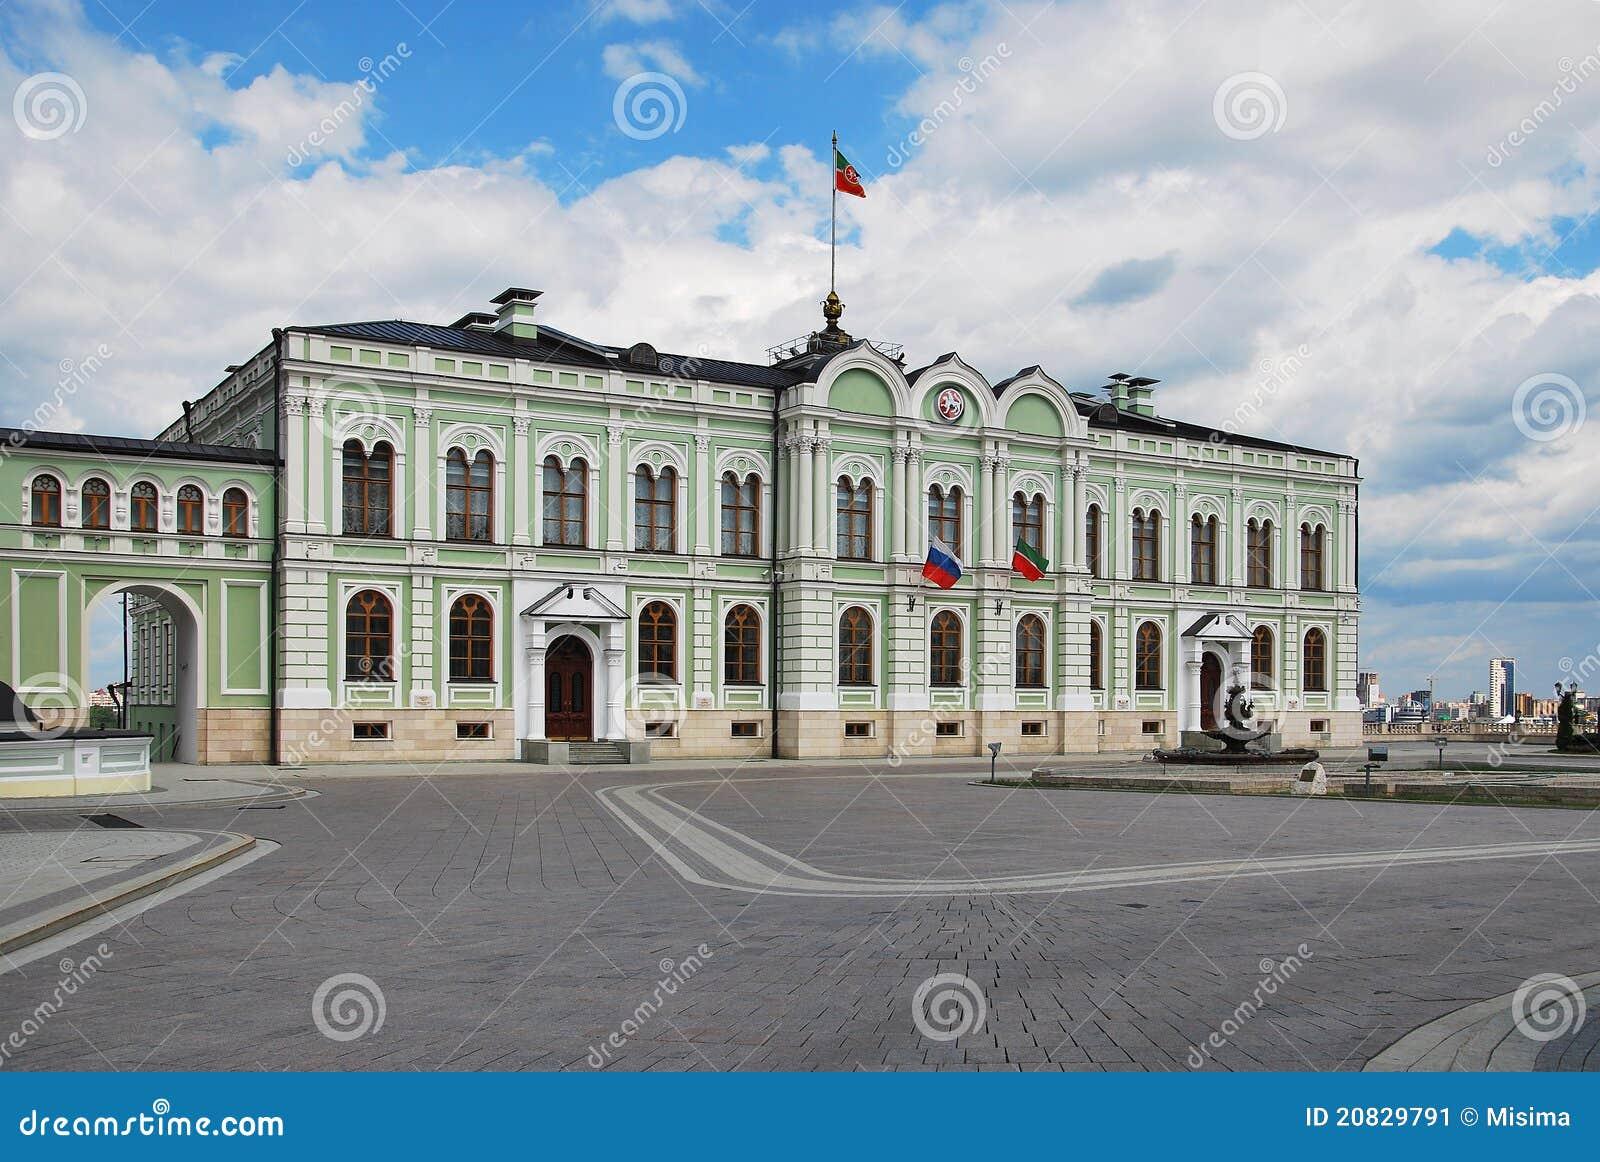 President palace in Kazan city